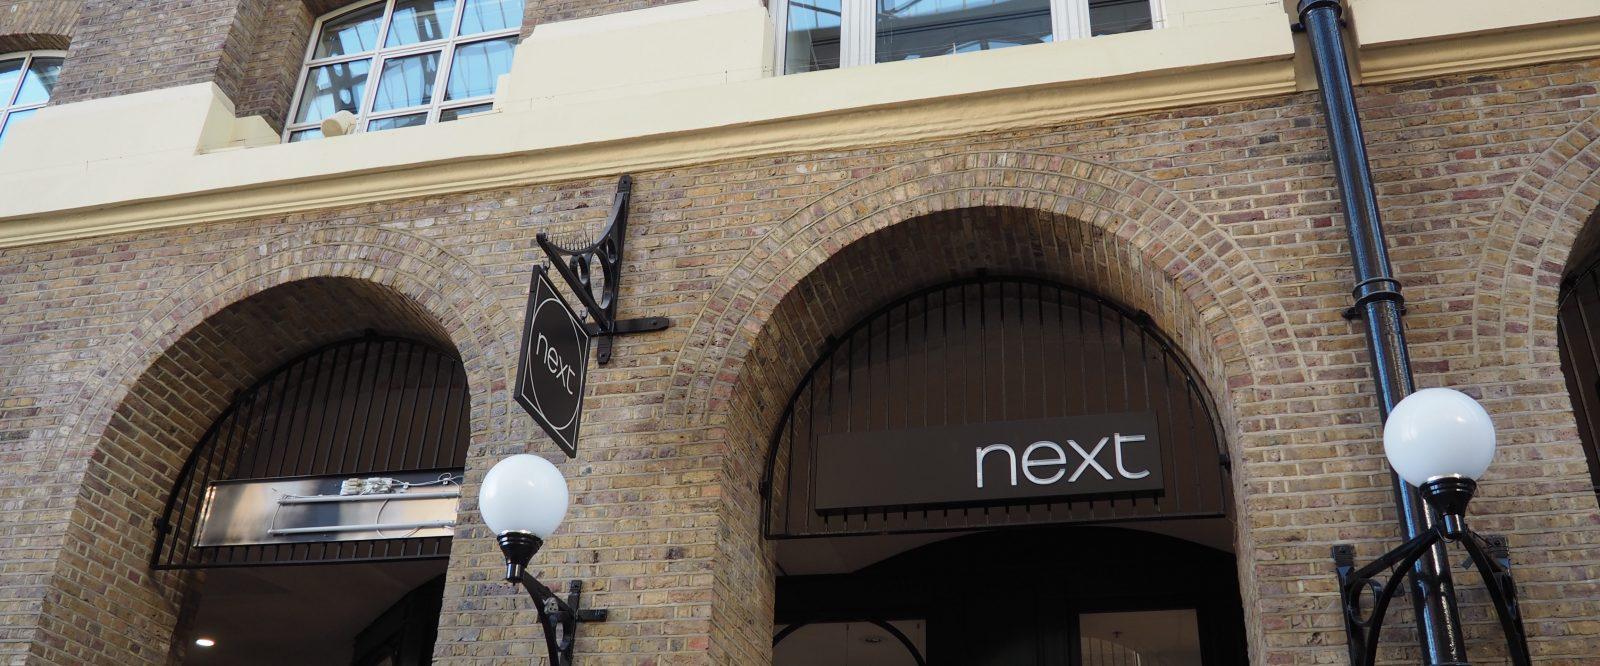 nextlondonbridge.jpg